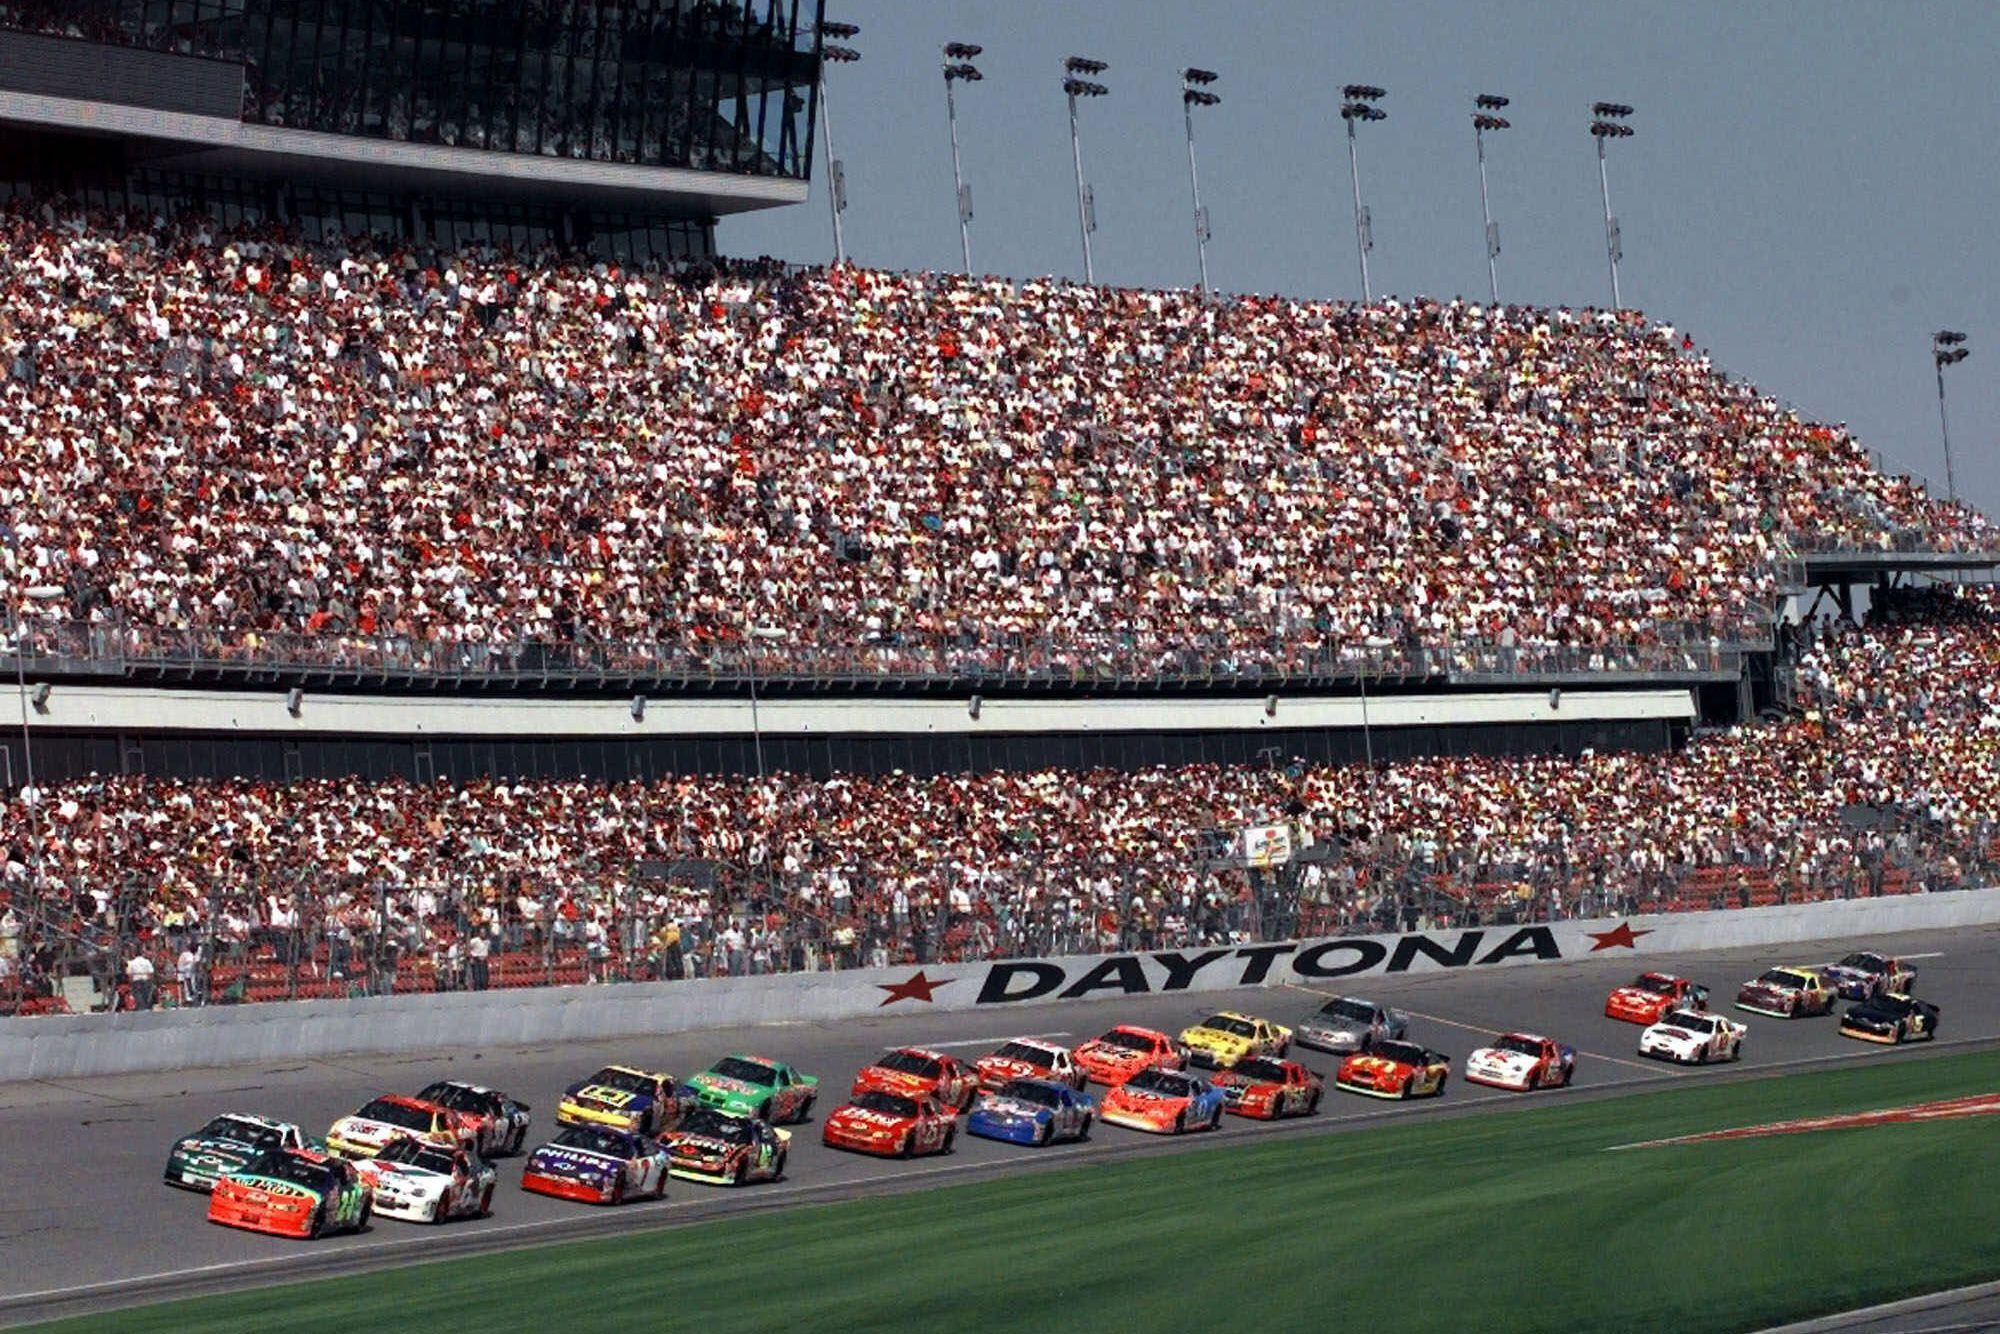 Icymi Track 5th Straight Sellout For Season Opening Daytona 500 Daytona 500 Daytona Soccer Field